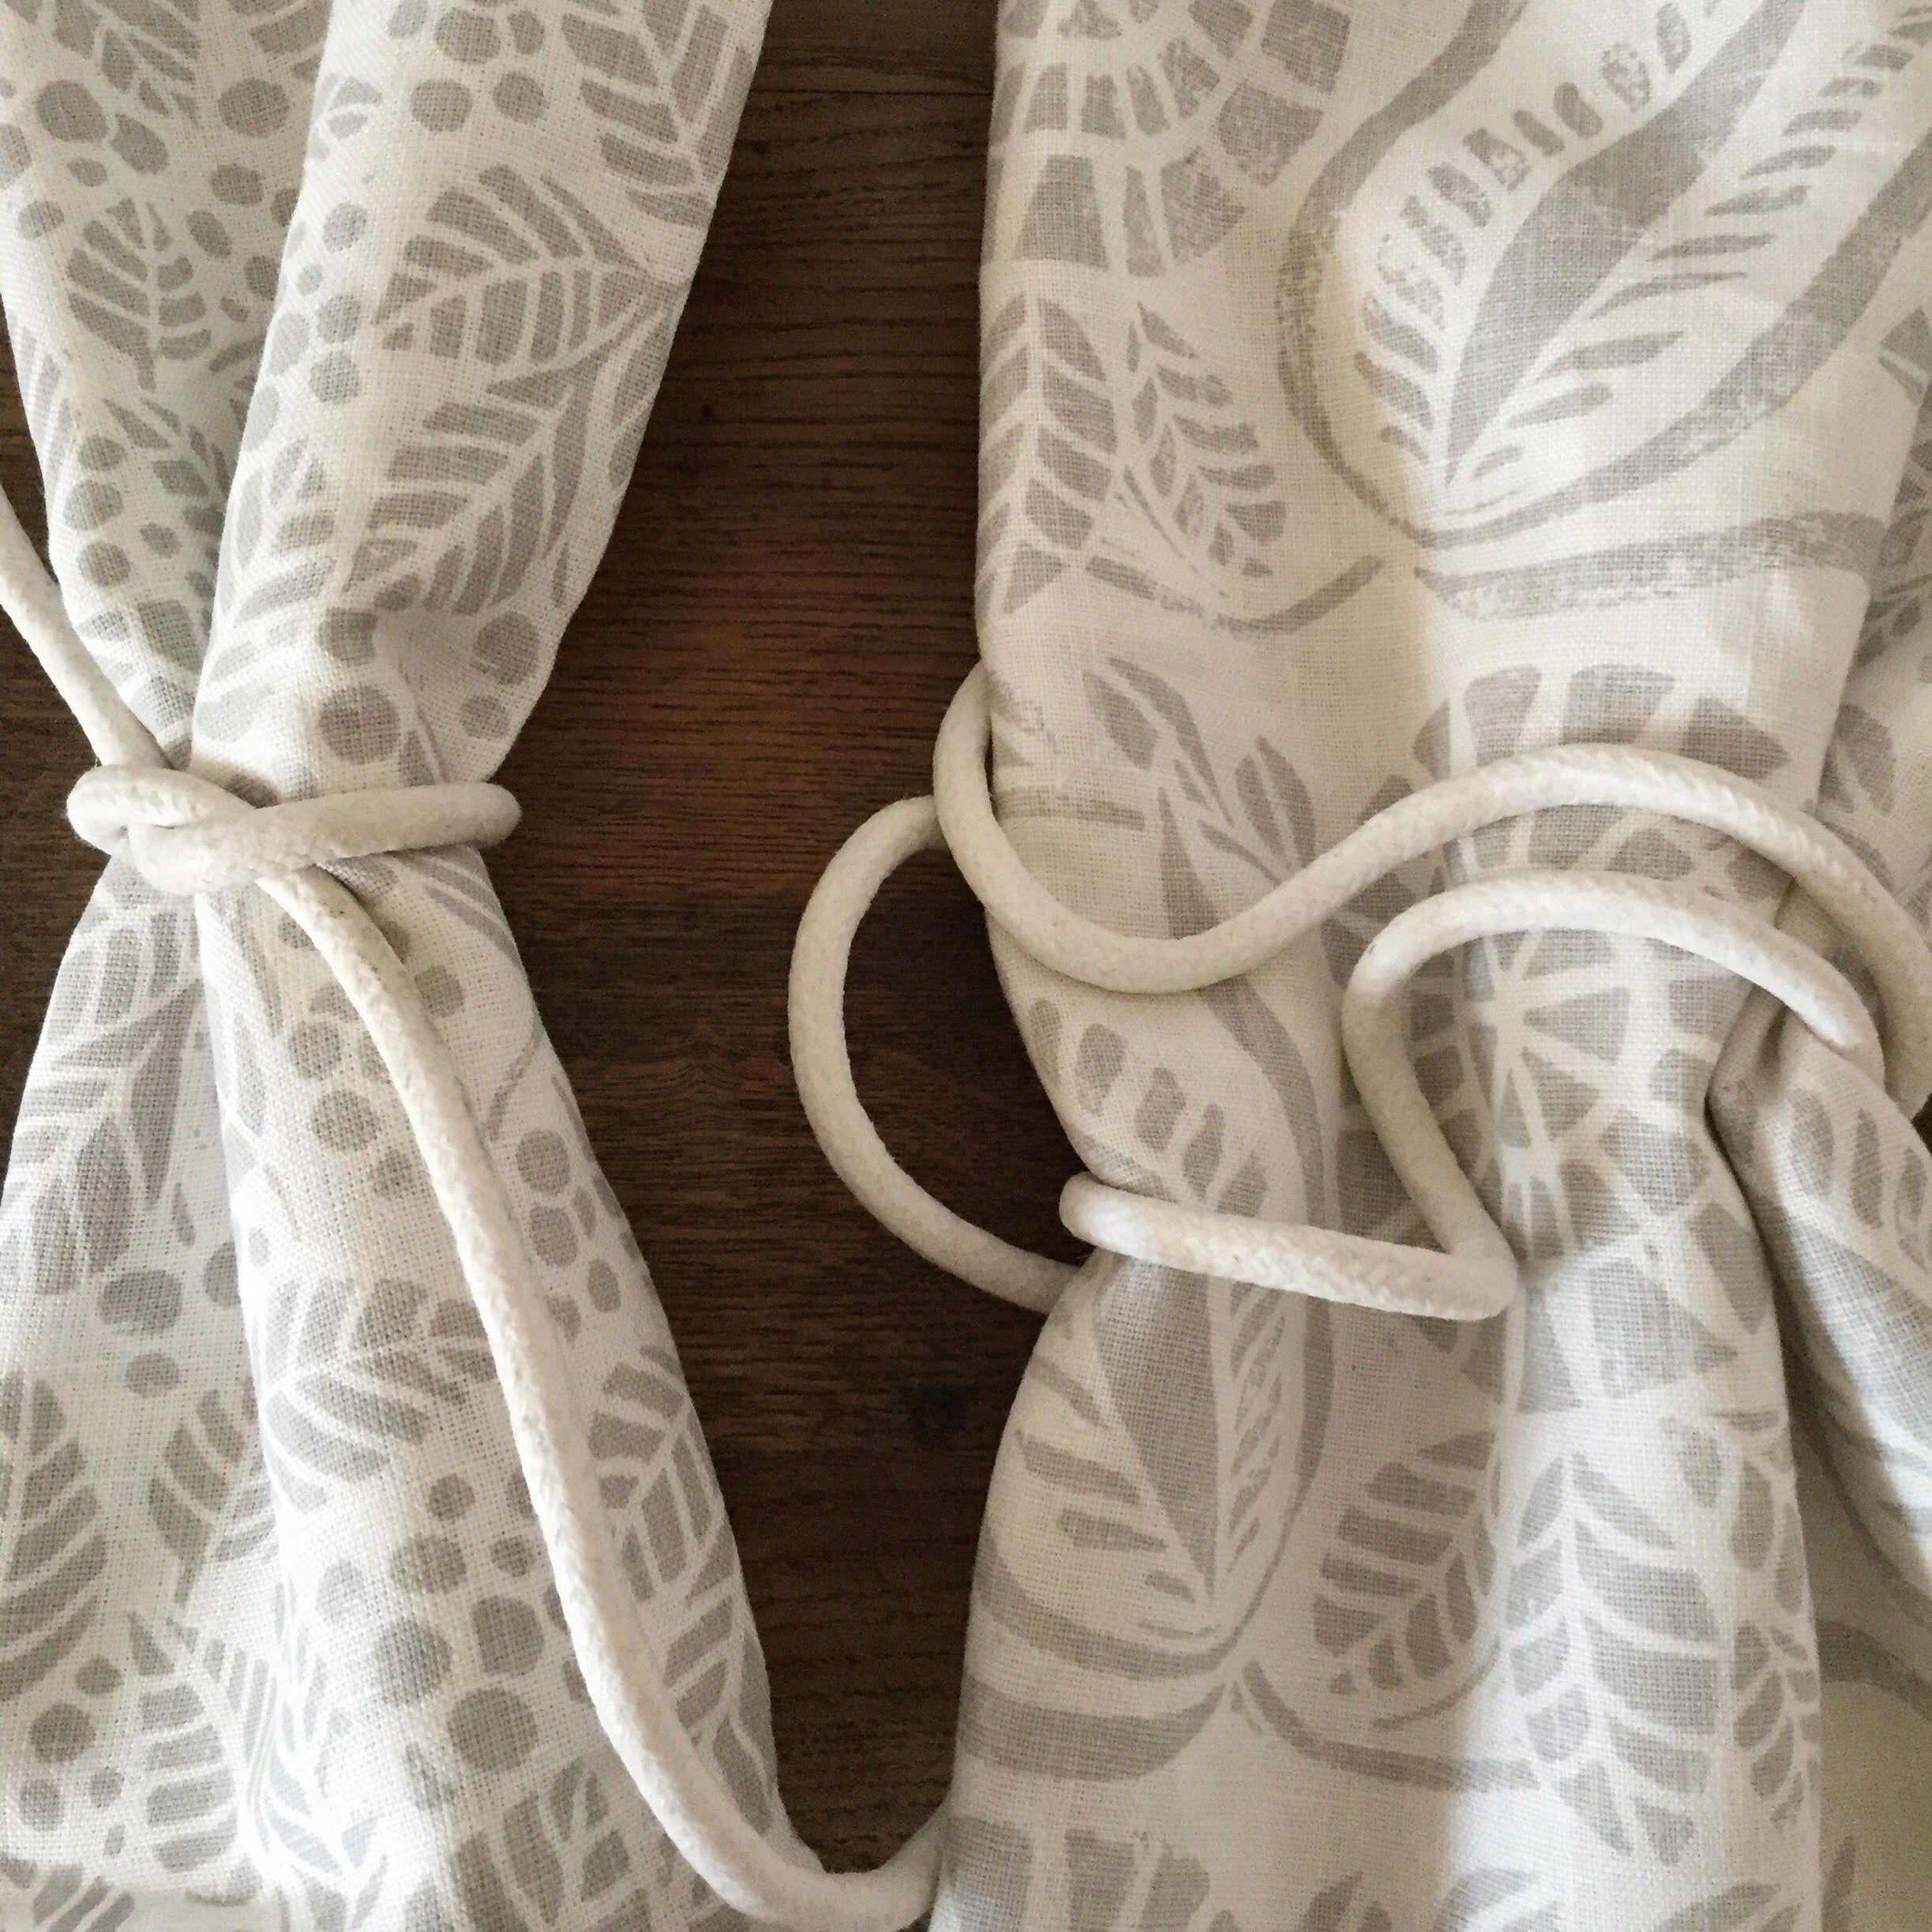 Pale Grey Bloomsbury Tibbs on white linen Hand silkscreened 2447x2447